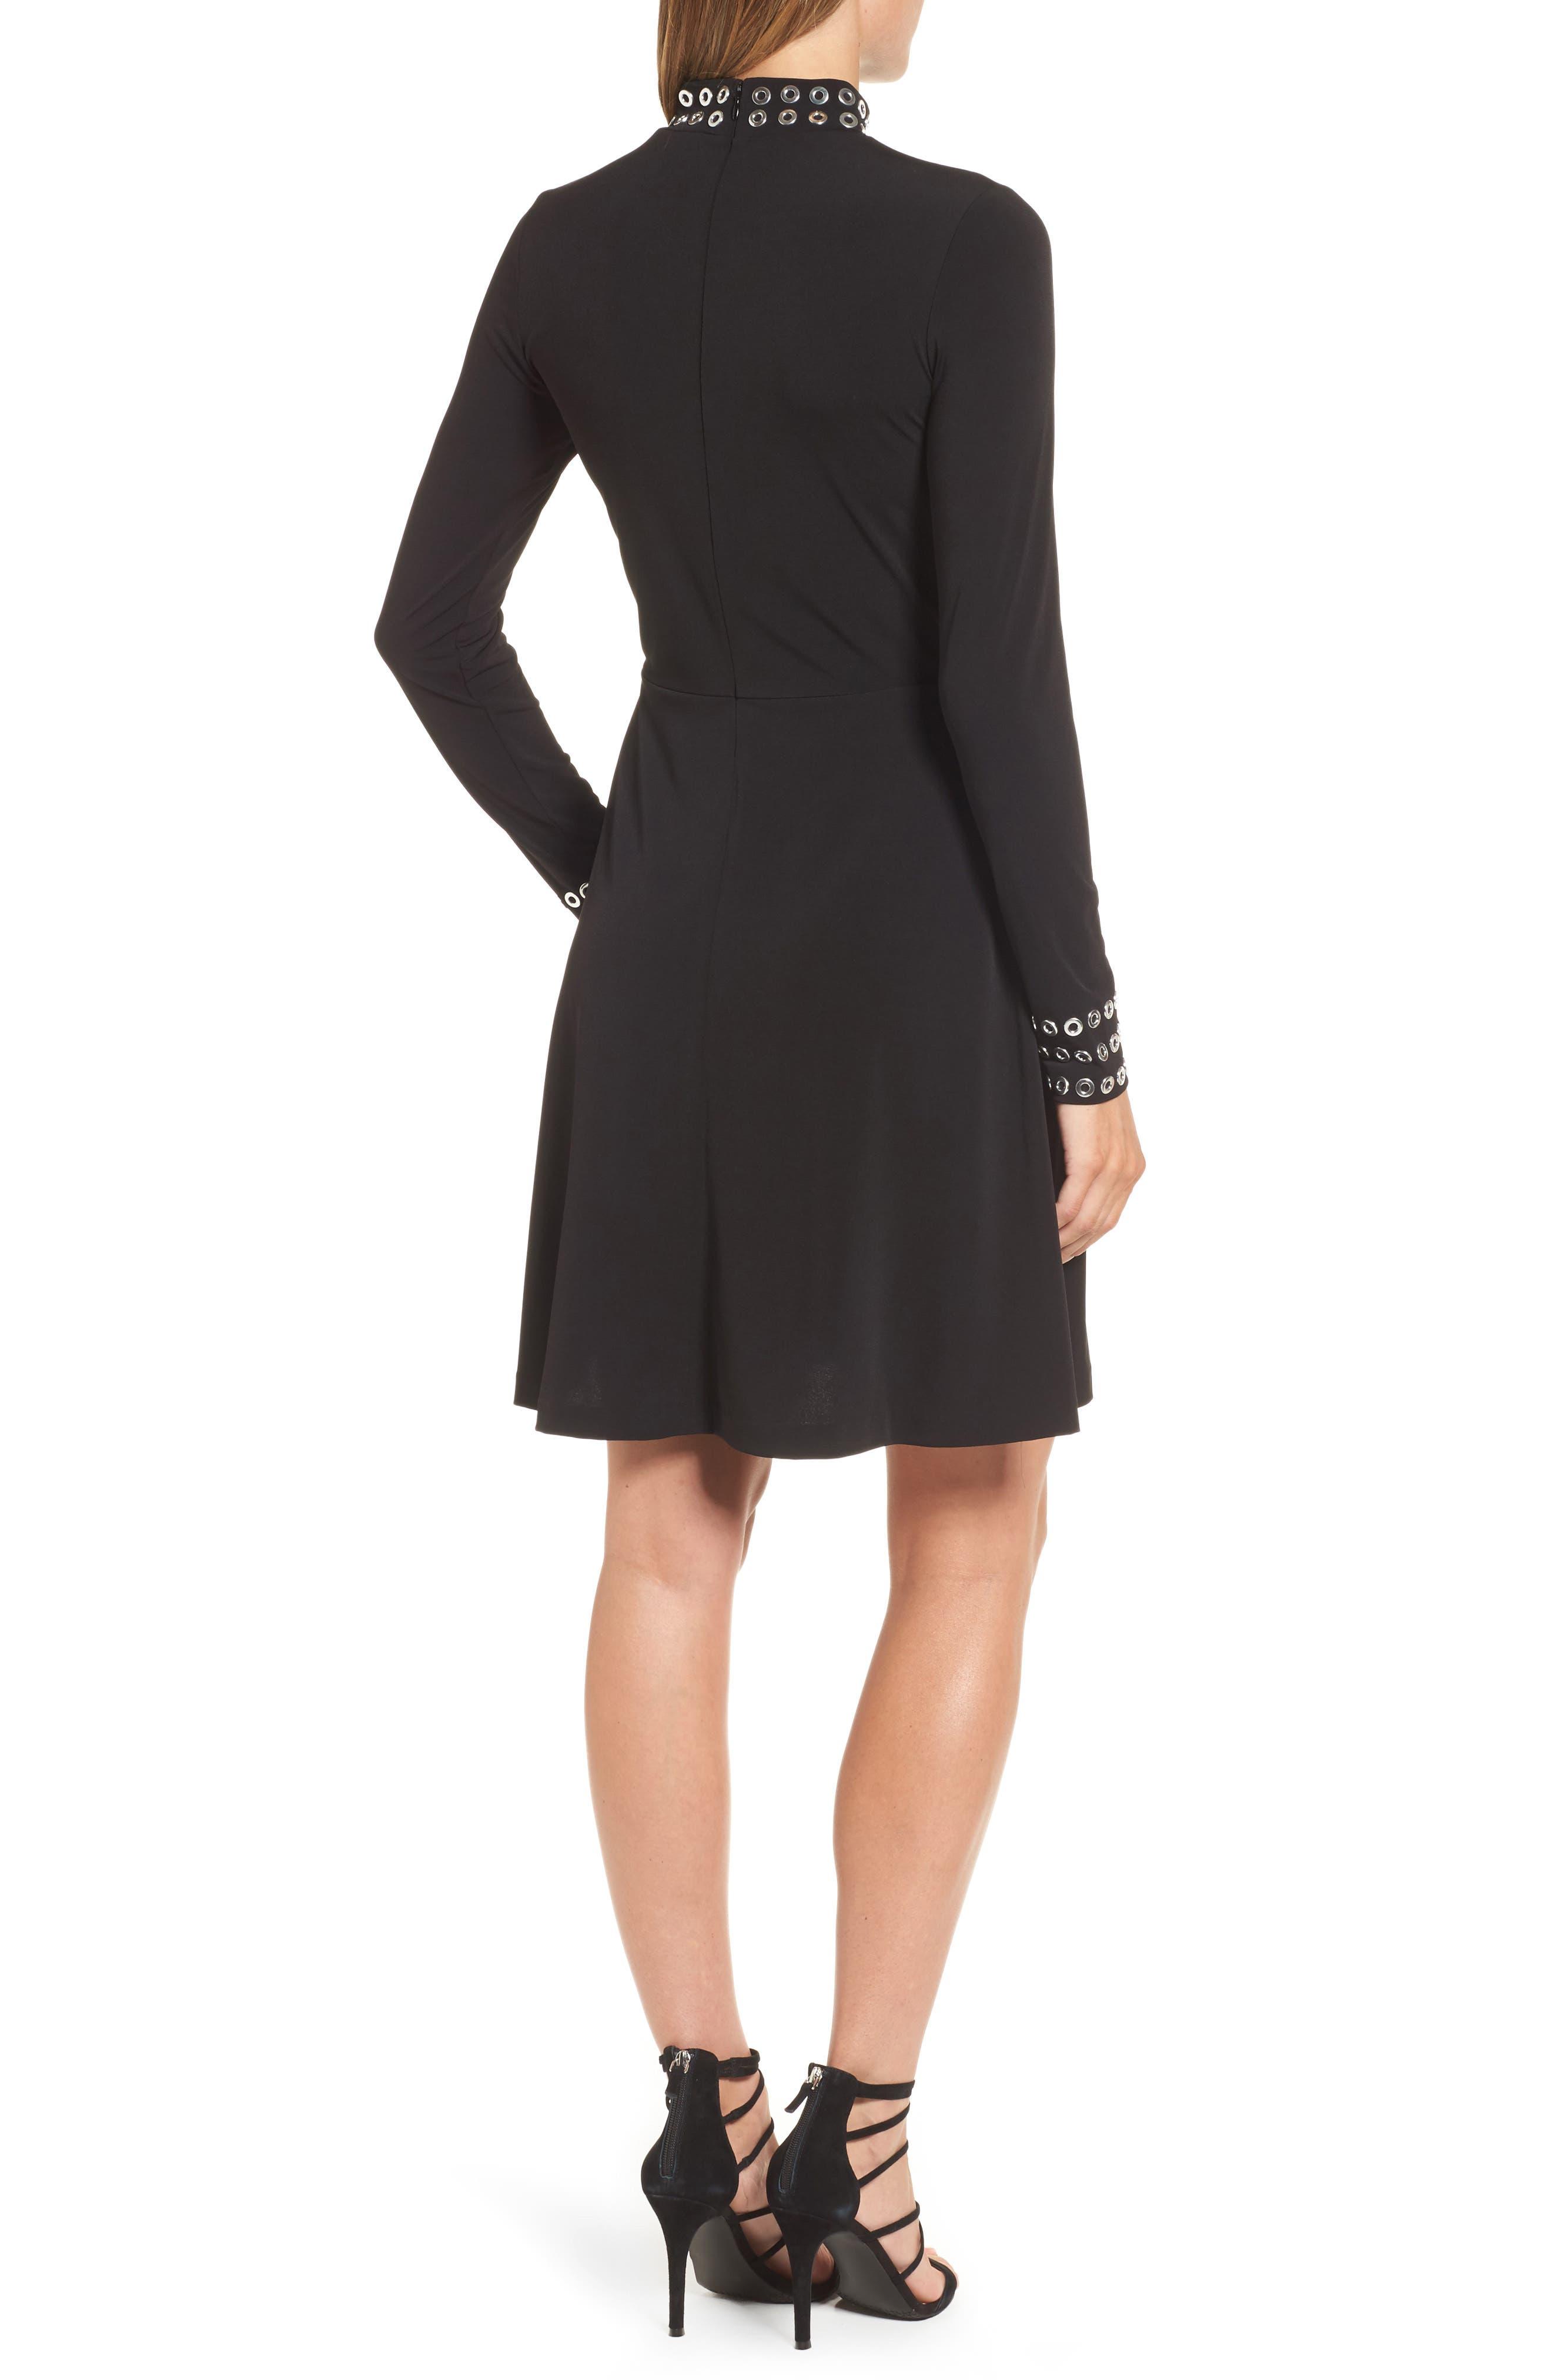 Grommet Mock Neck Knit Dress,                             Alternate thumbnail 2, color,                             Black